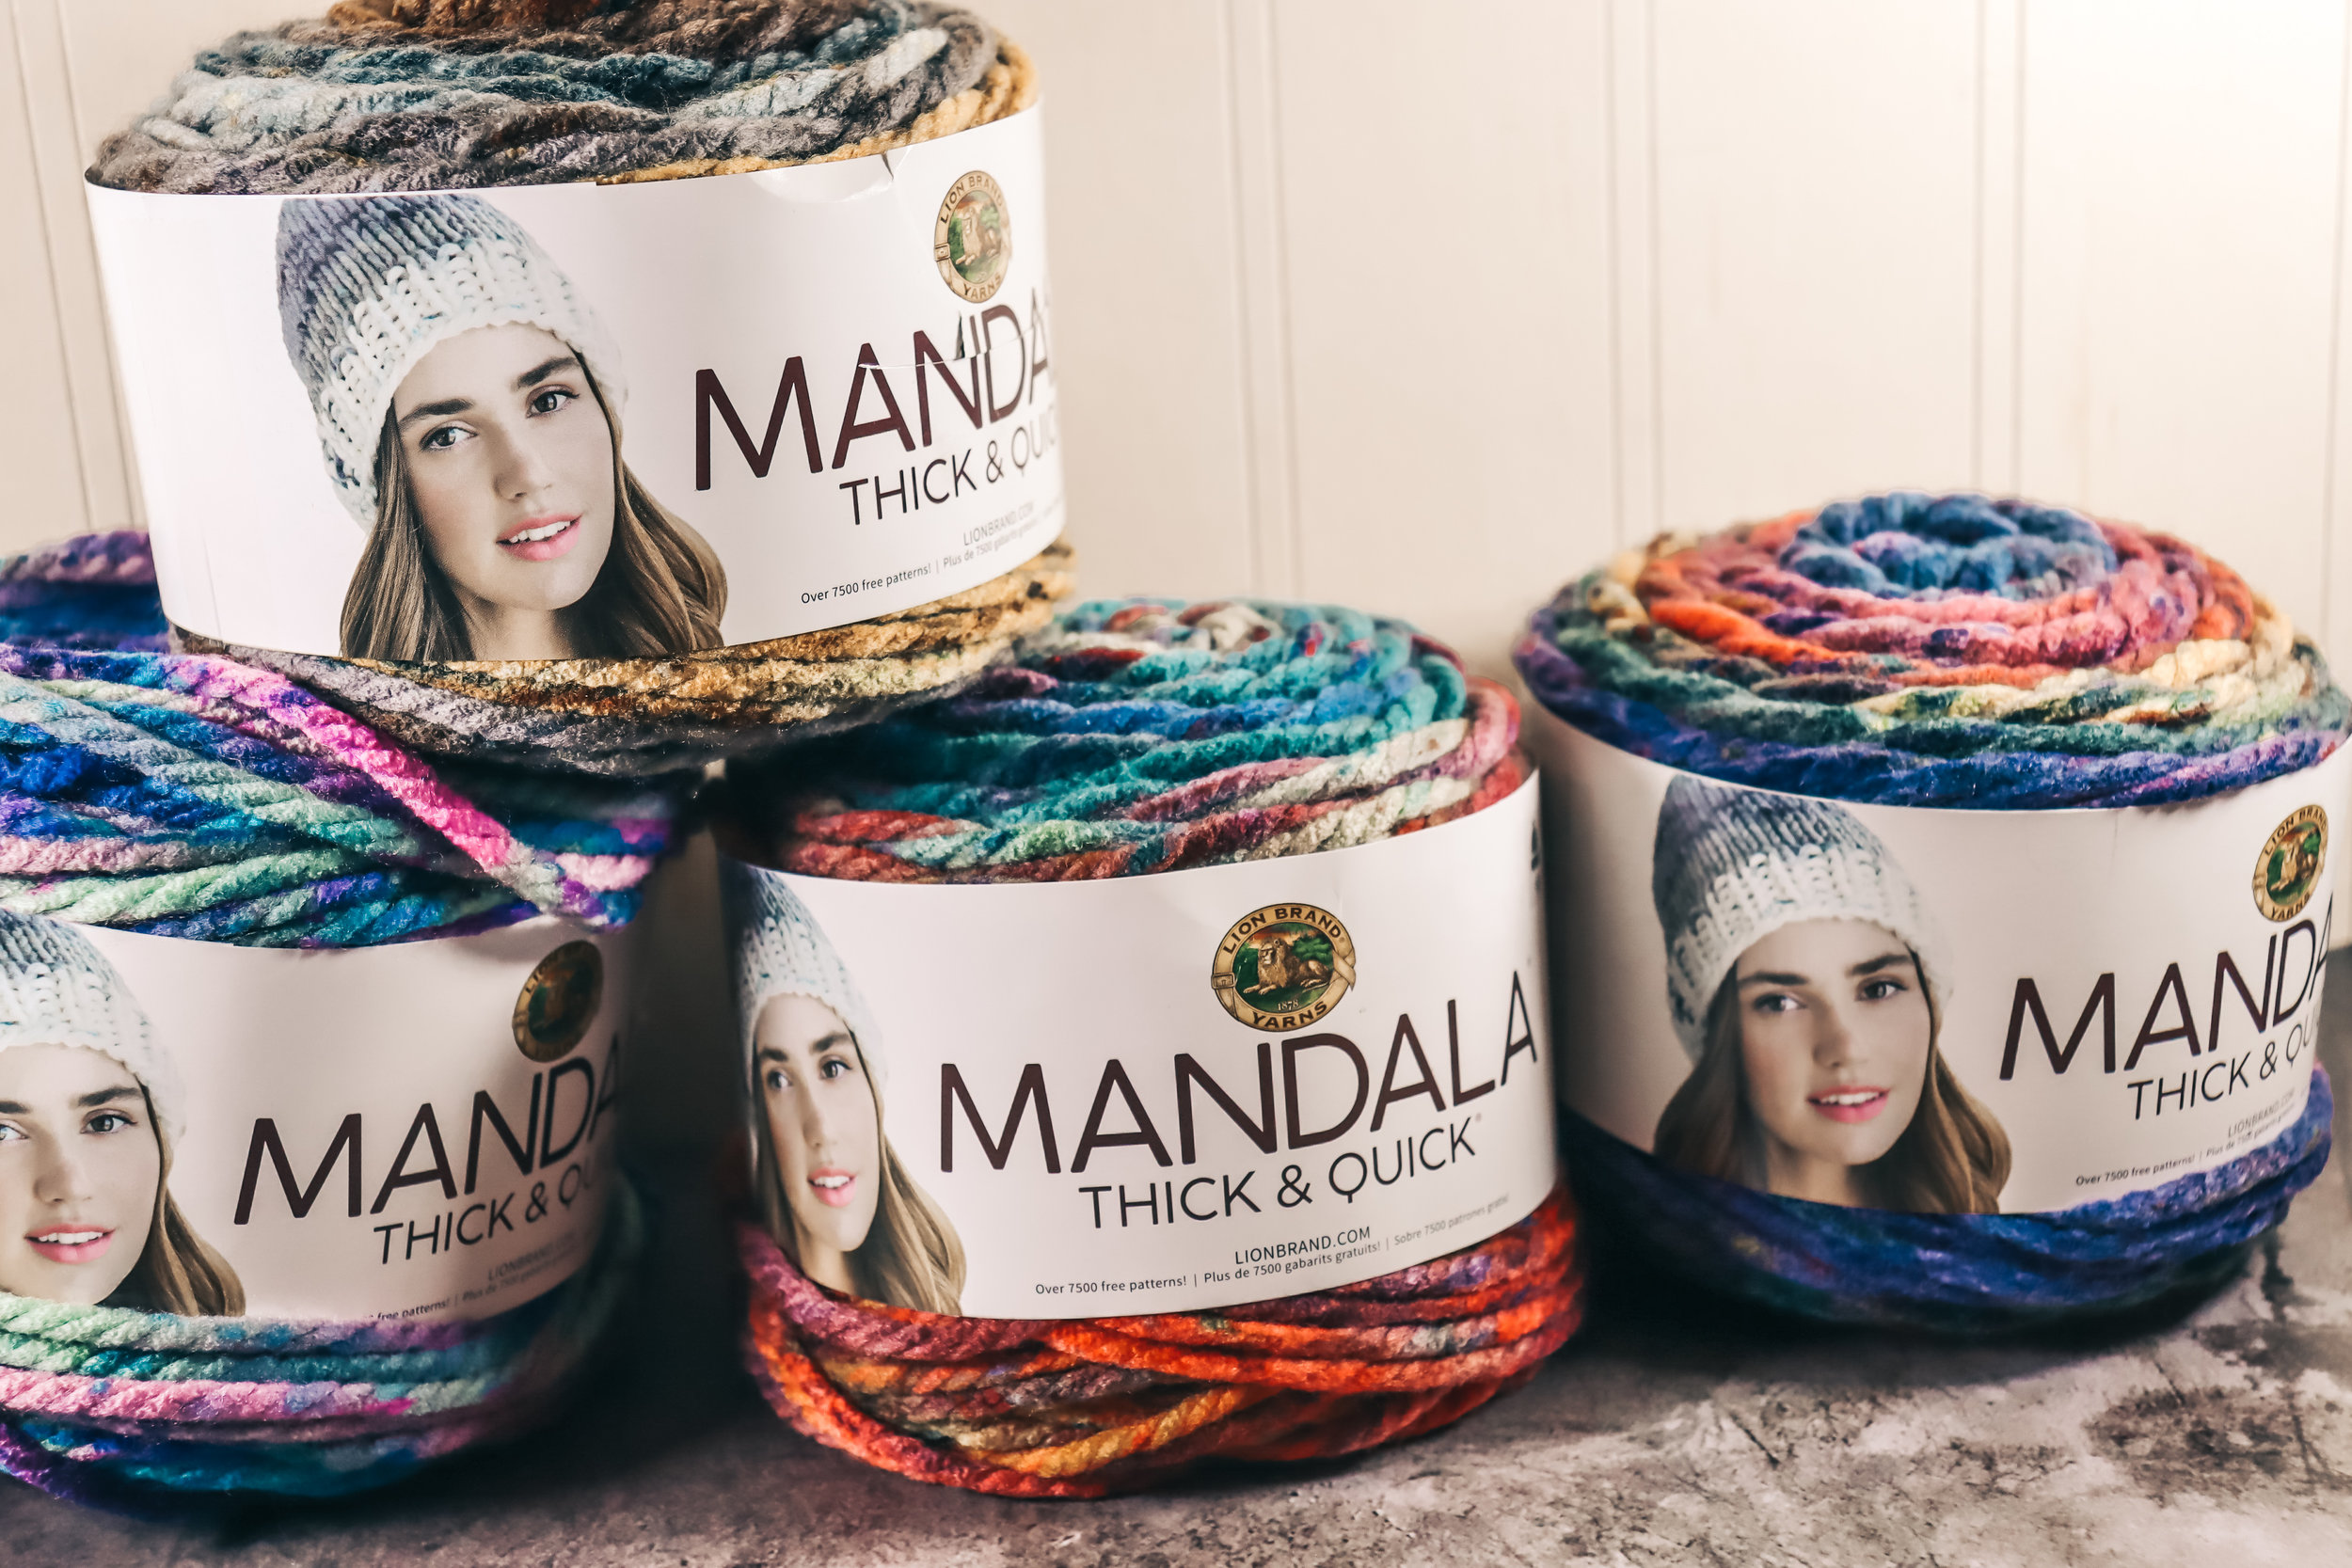 Mandala Thick & Quick - Fibers - The Roving Nomad